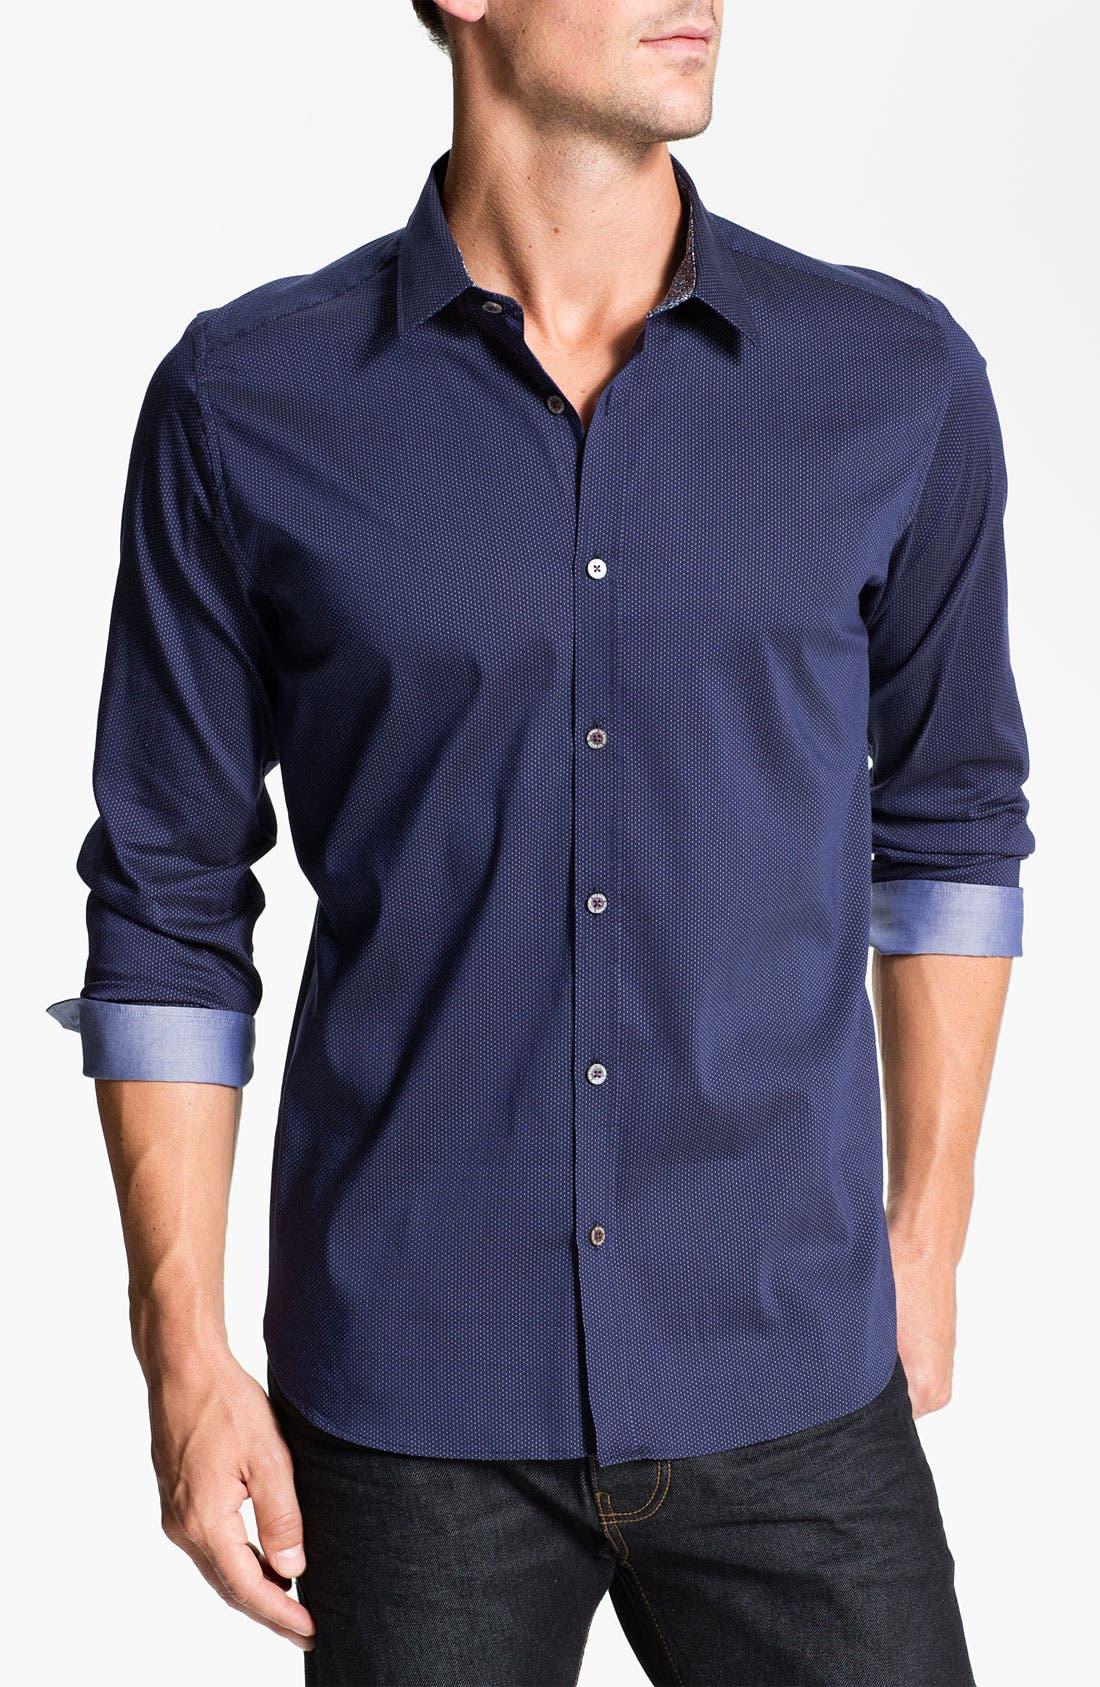 Alternate Image 1 Selected - Ted Baker London 'Tantic' Sport Shirt